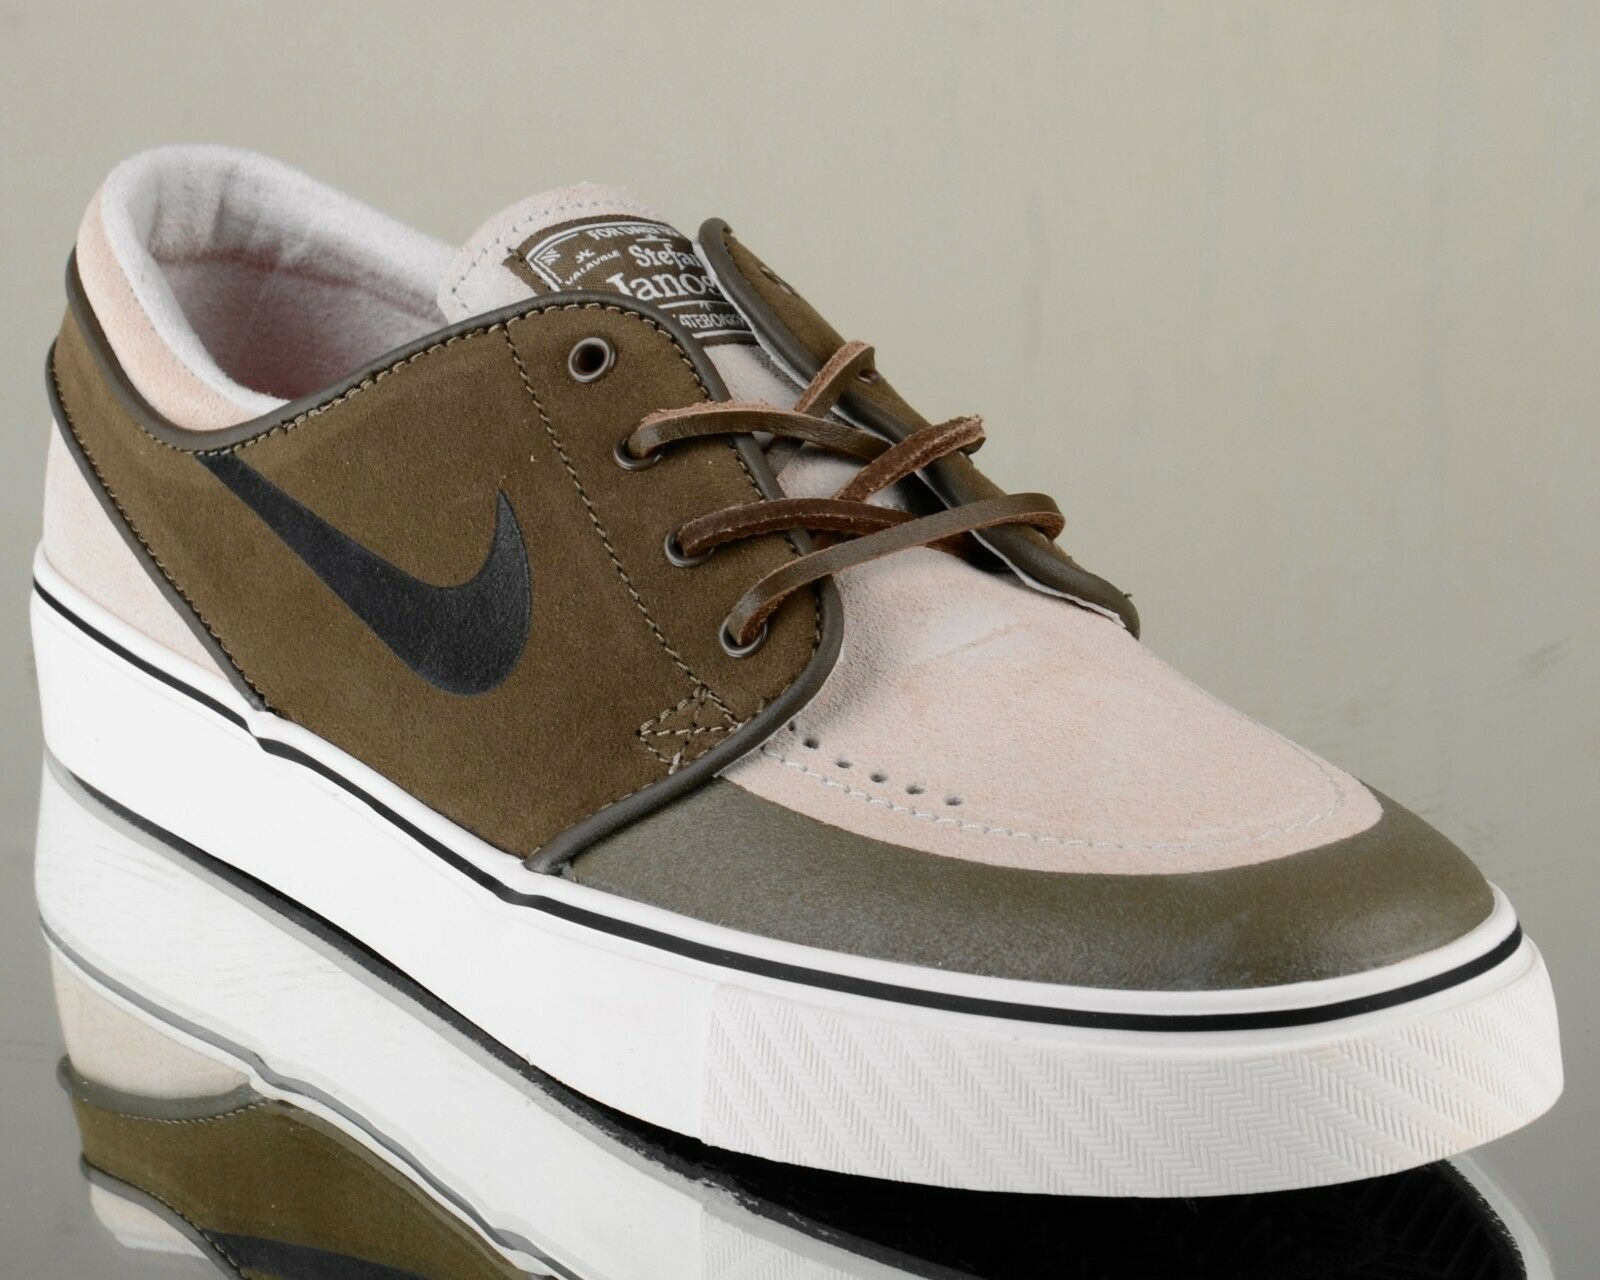 Nike Zoom Stefan Janoski Premium SE low Uomo lifestyle SB scarpe da ginnastica 631298-201